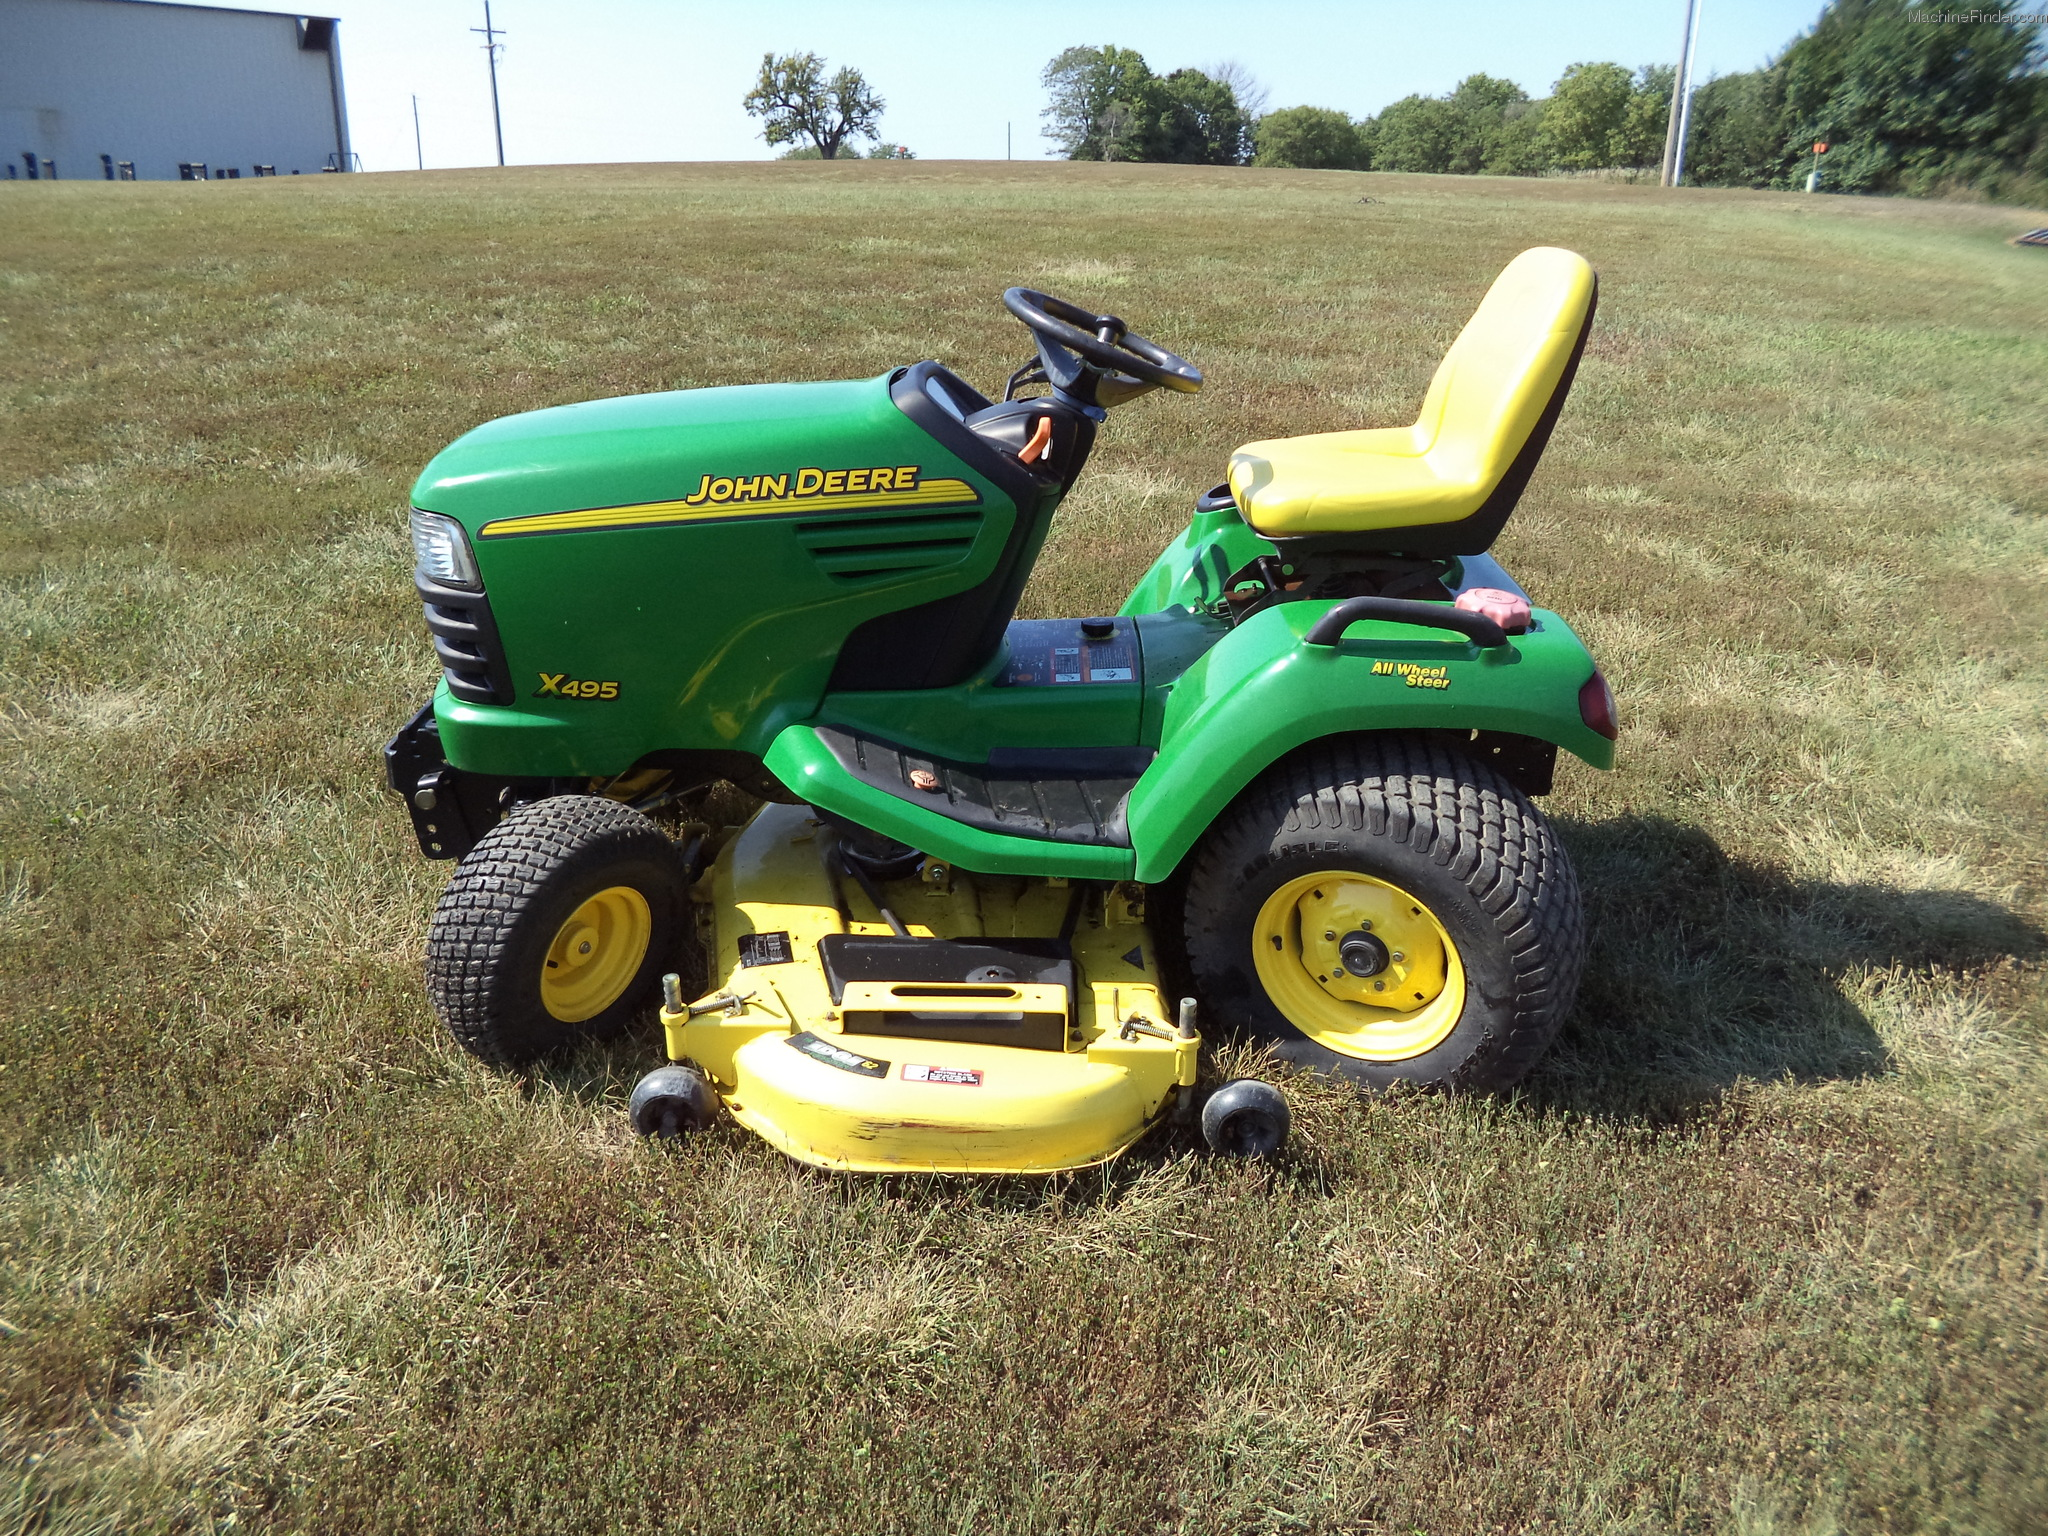 2004 John Deere X495 Lawn & Garden and Commercial Mowing ...